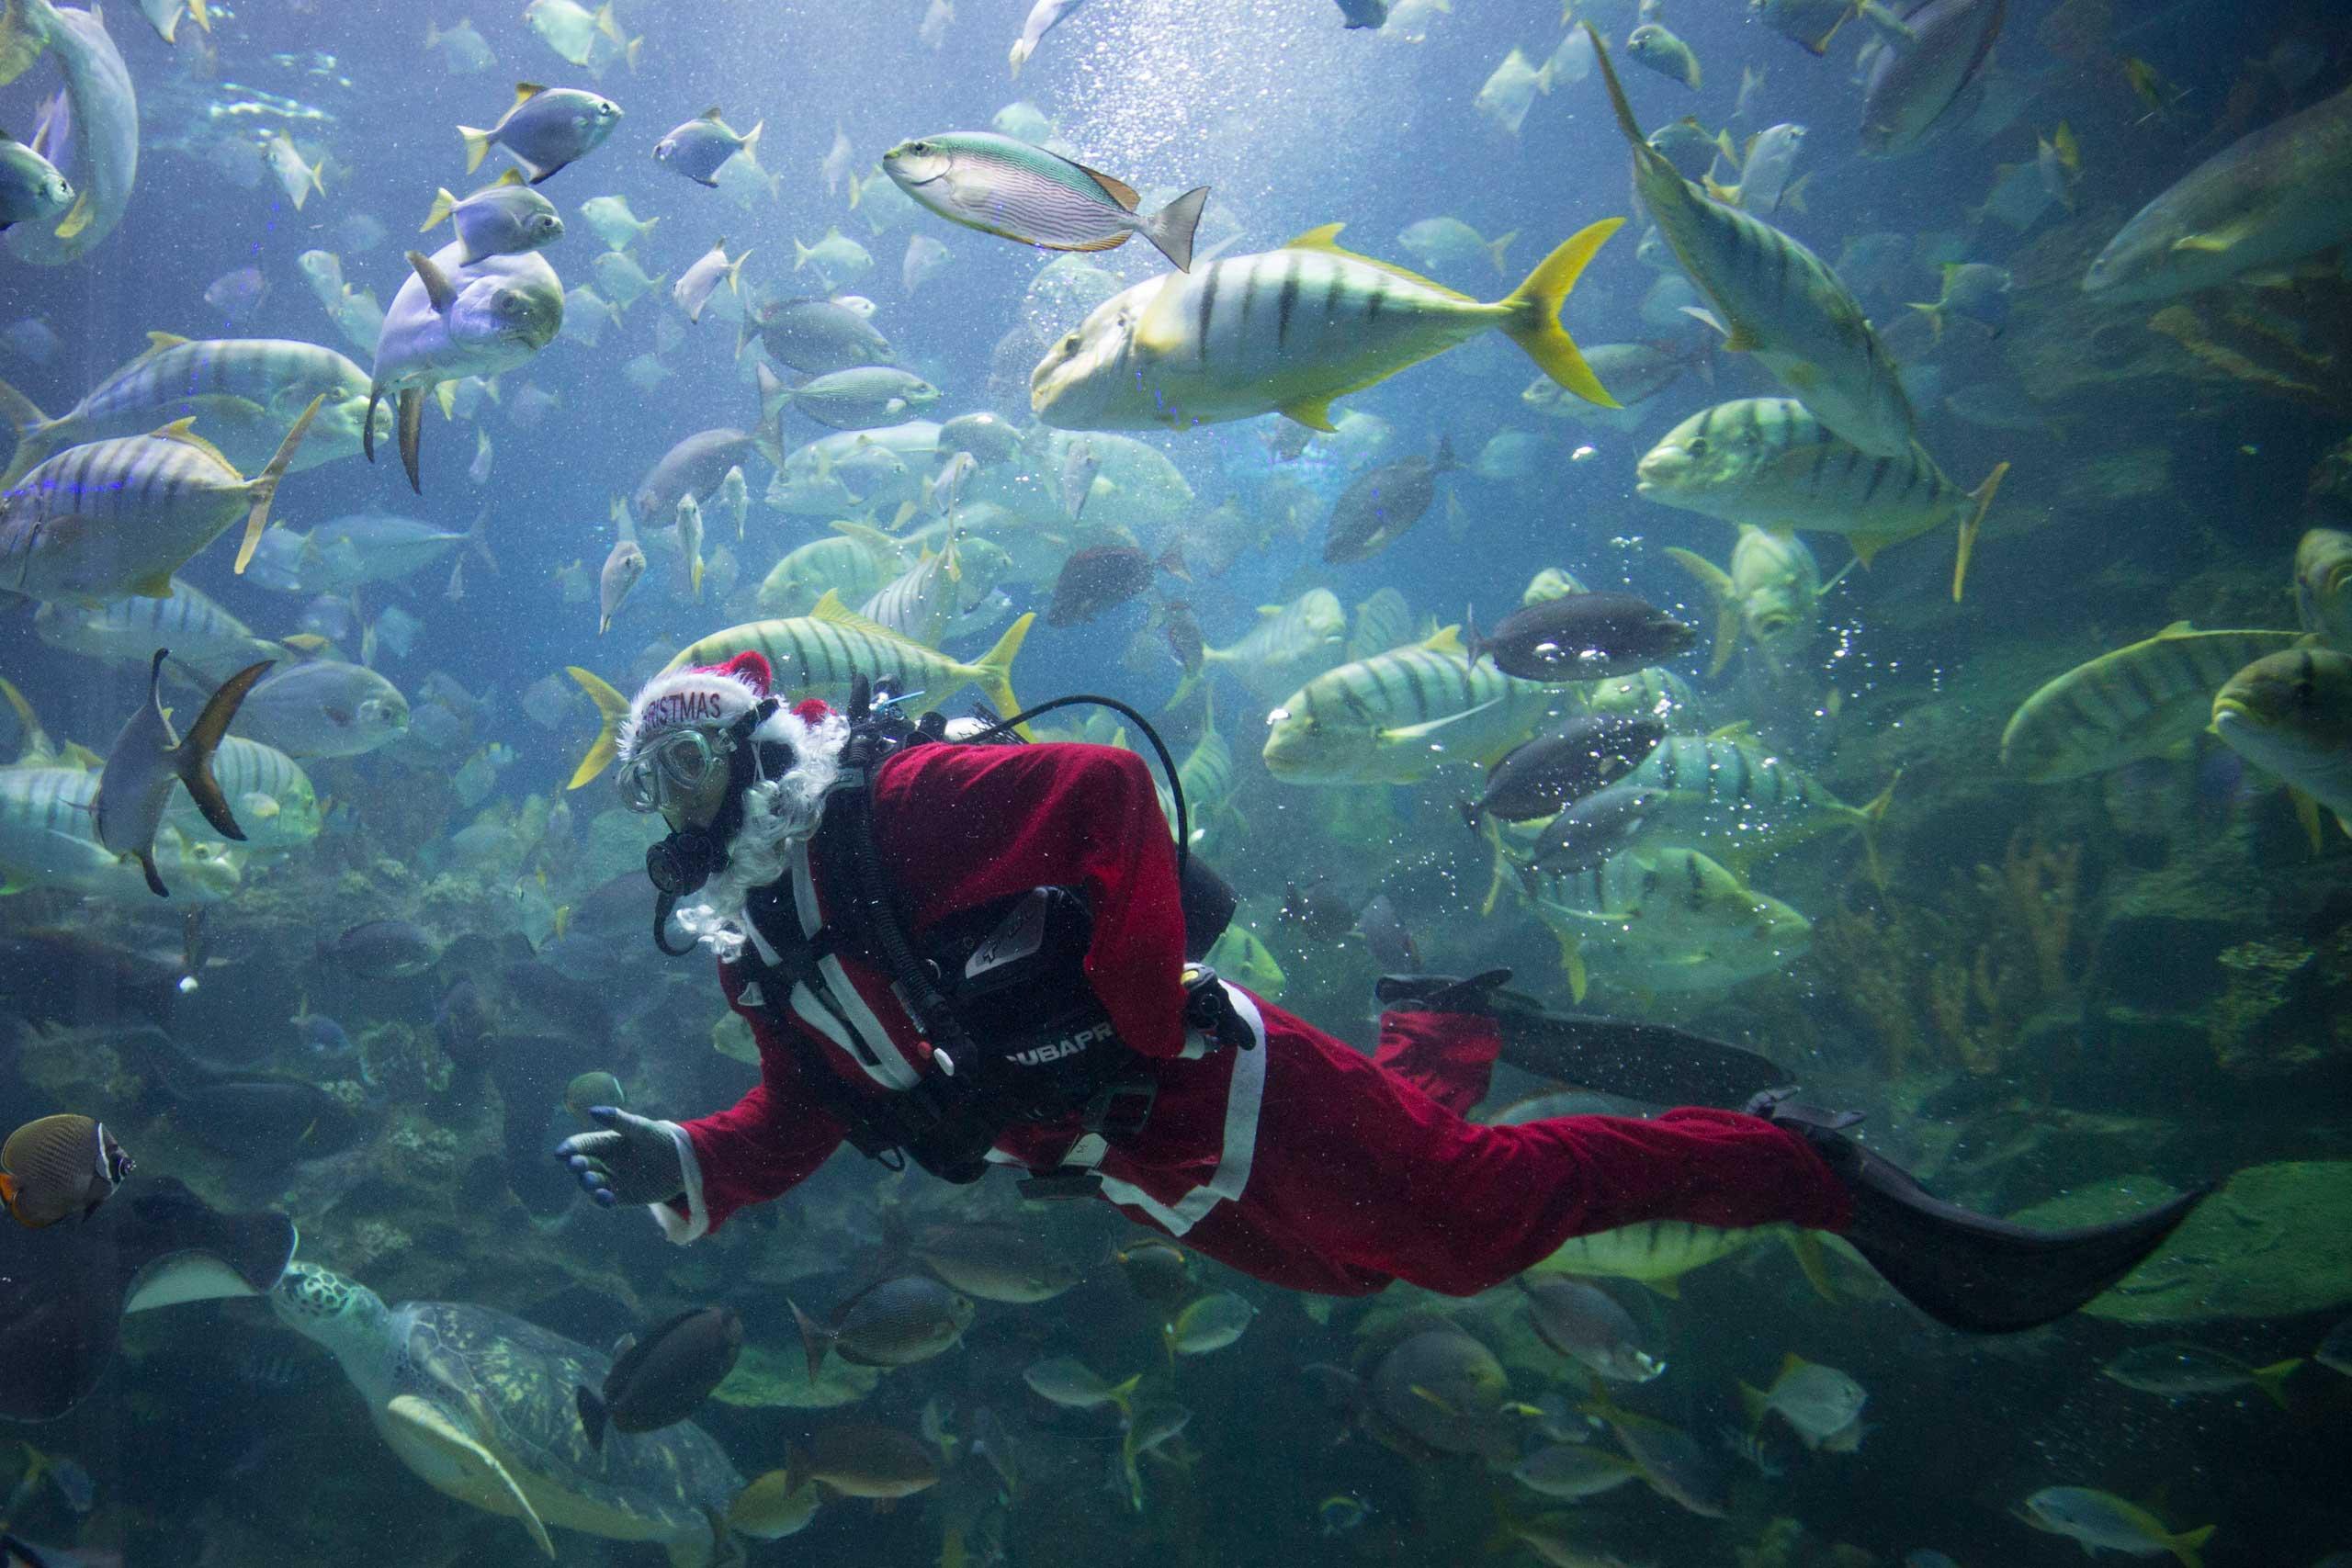 Dec. 16, 2014. A diver in Santa costume feeds fish as part of upcoming Christmas celebrations at Aquaria KLCC underwater park in Kuala Lumpur, Malaysia.